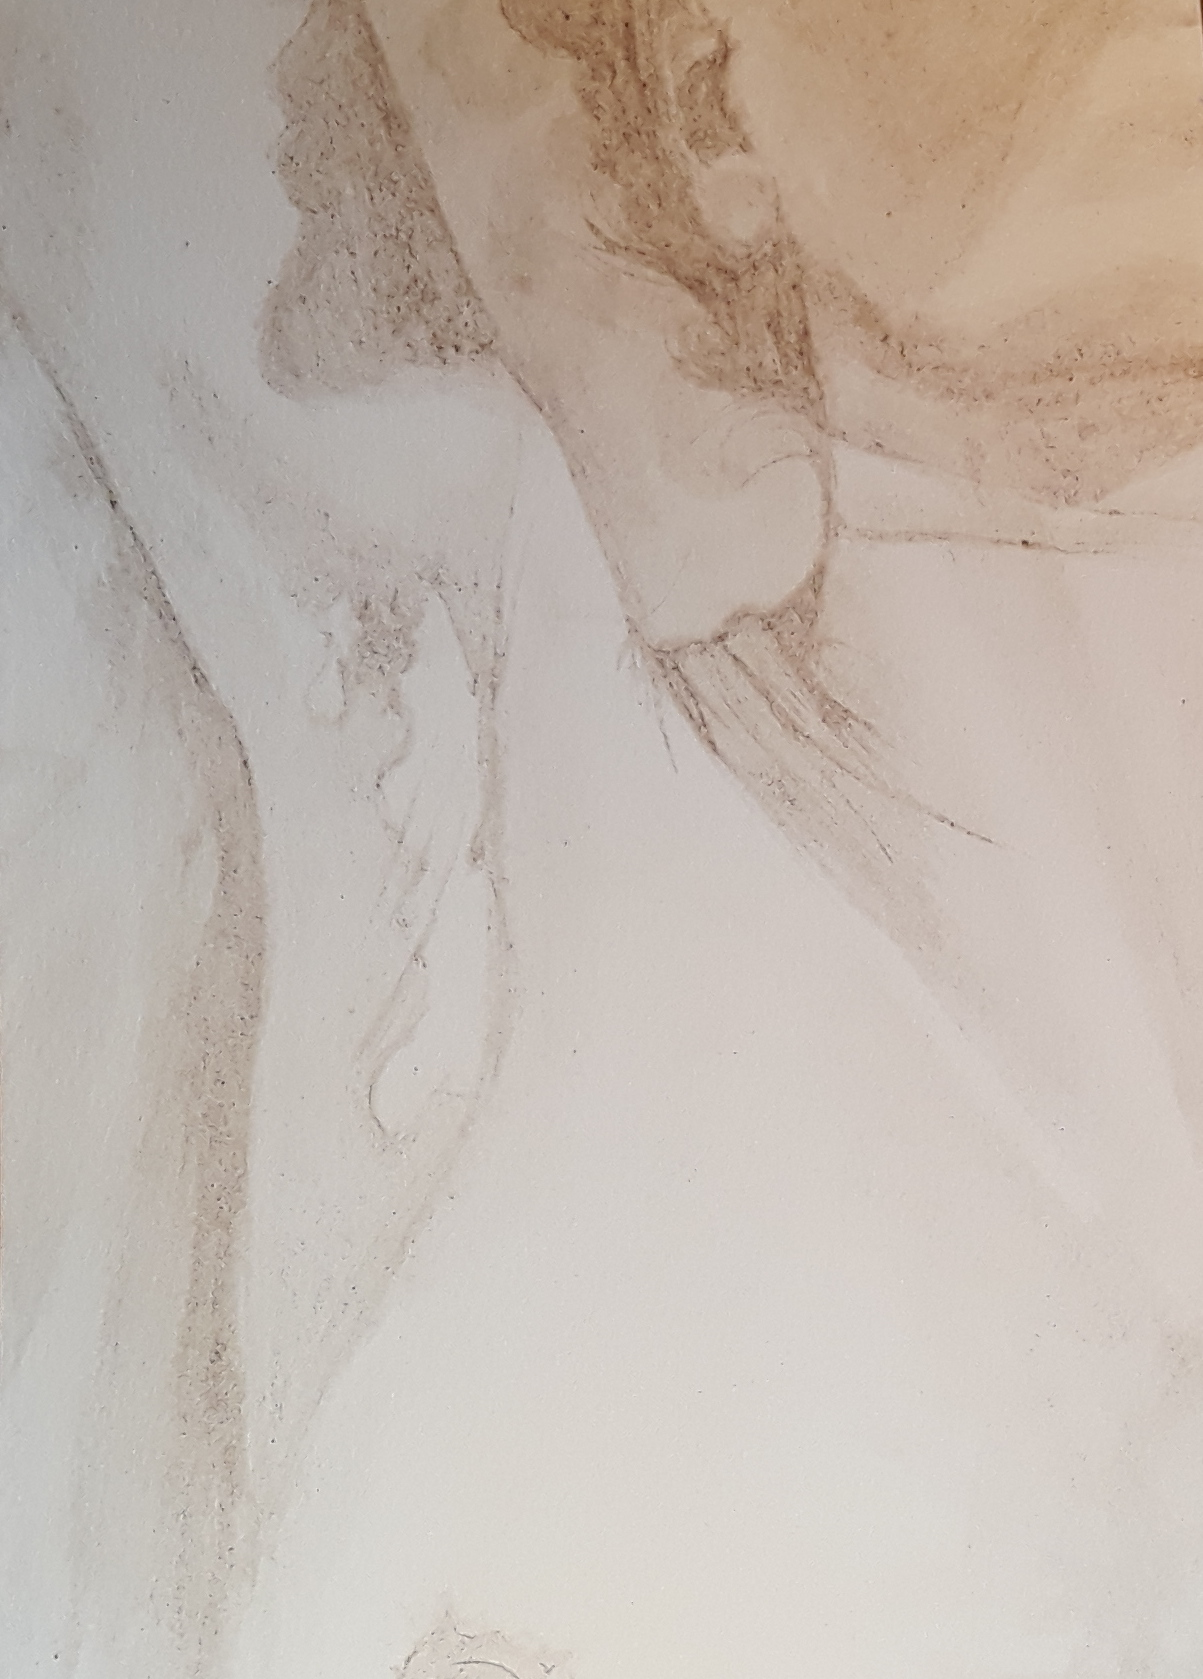 Nebula 1 (Suzanne Duncan Dust).jpeg